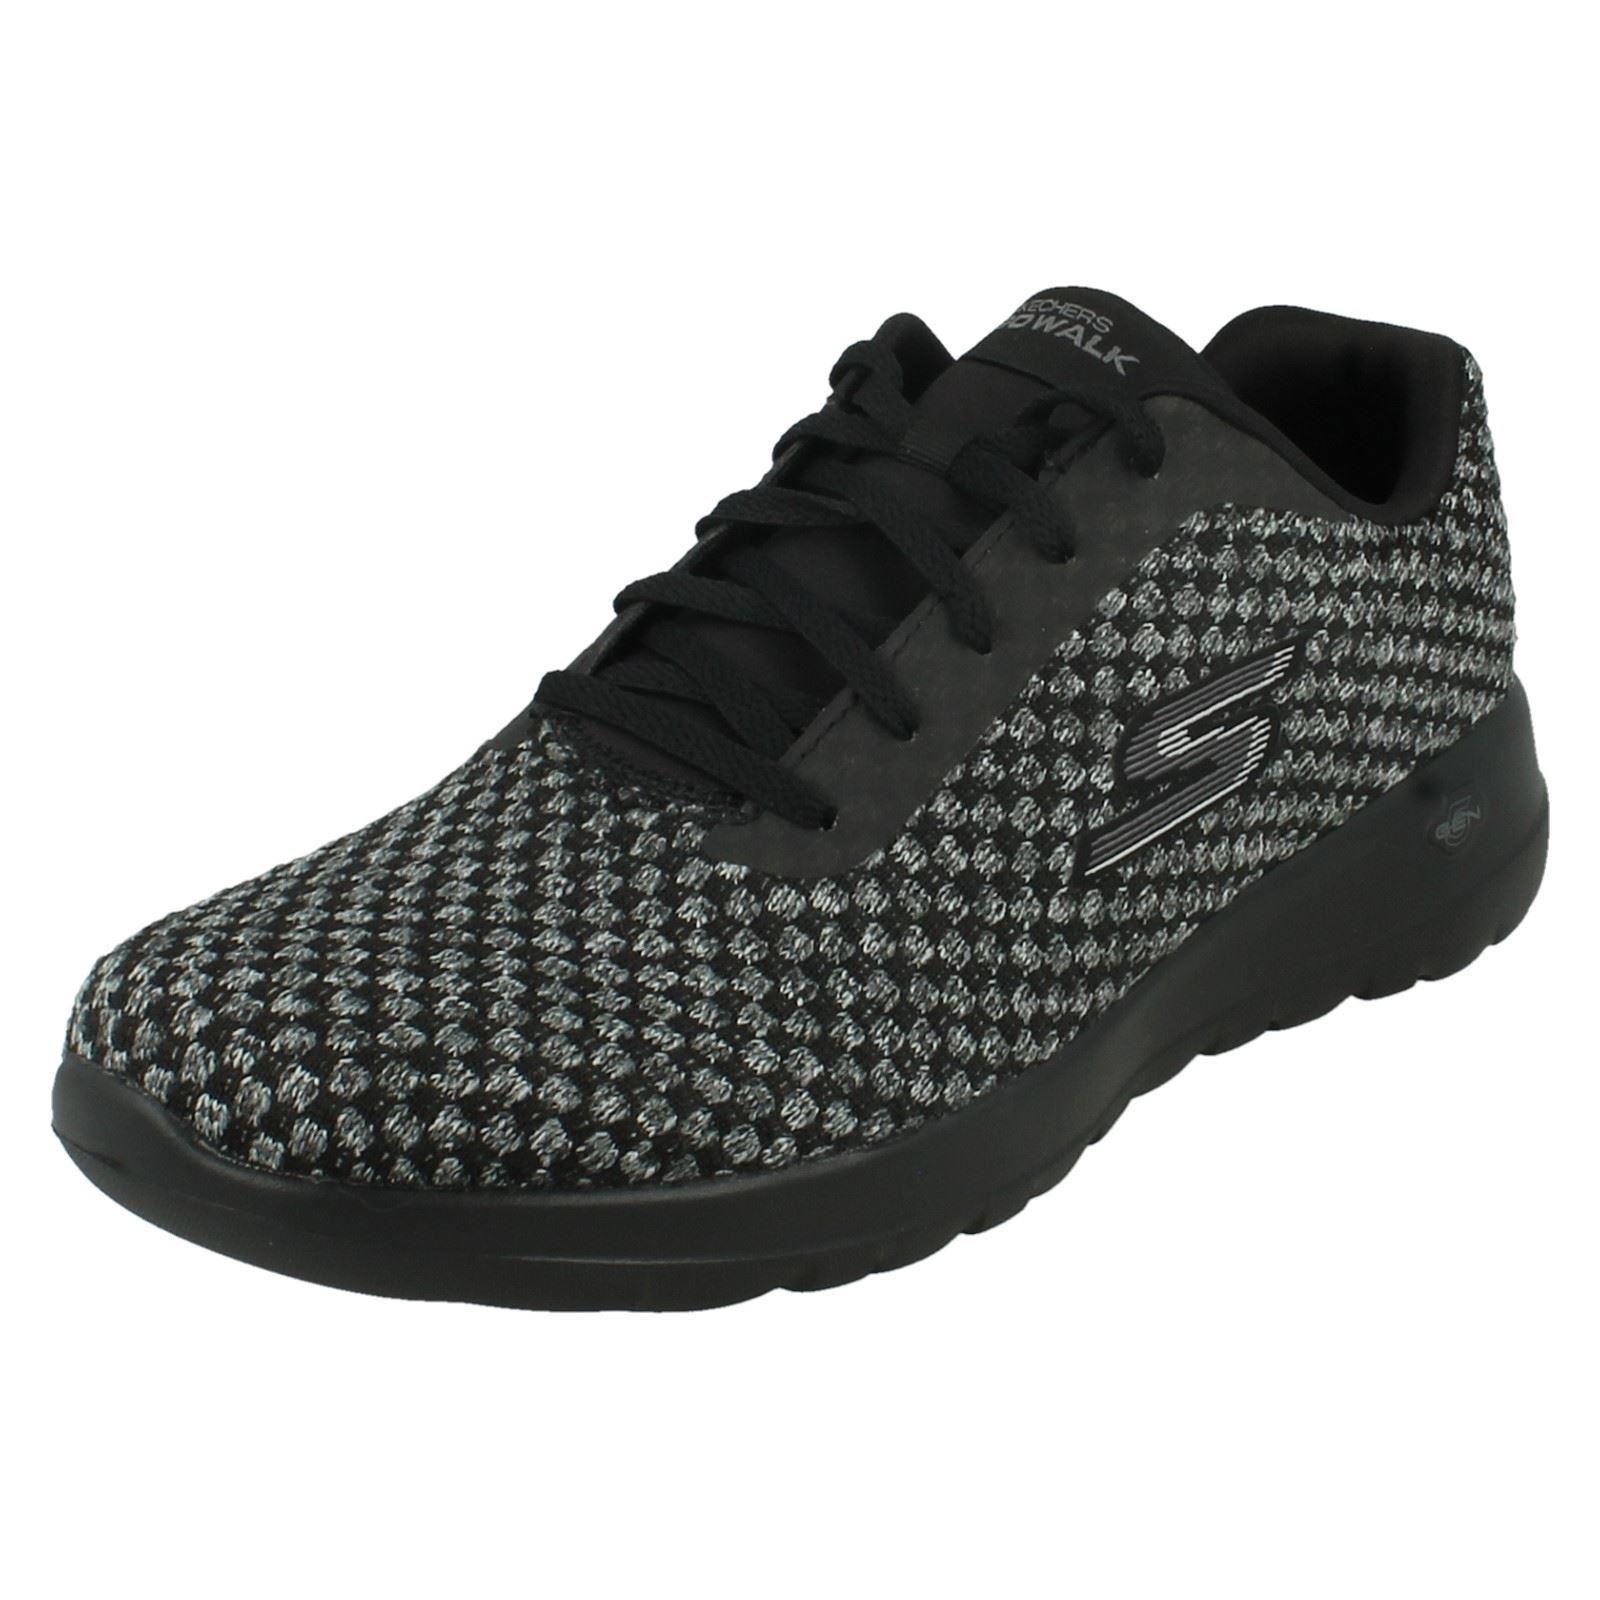 Femmes Walk Skechers Go Walk Femmes Joy Baskets Pivot dc4503